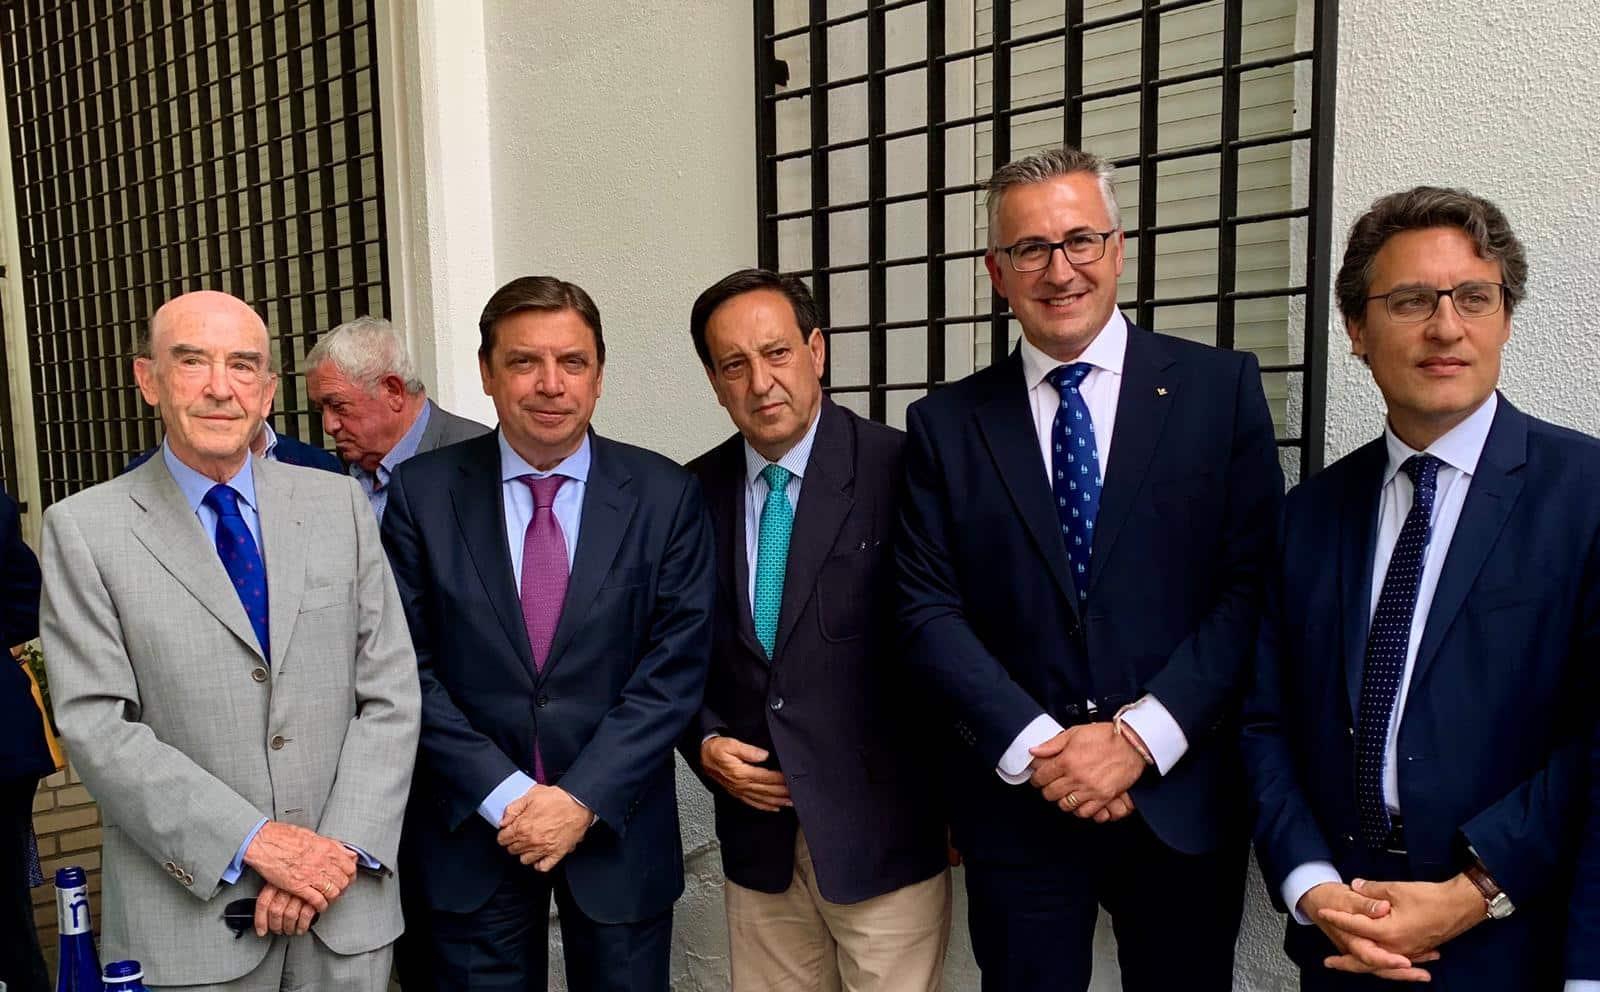 https://blog.globalcaja.es/wp-content/uploads/2019/08/Globalcaja-muestra-su-apoyo-al-sector-del-vino-en-Tomelloso-.jpg